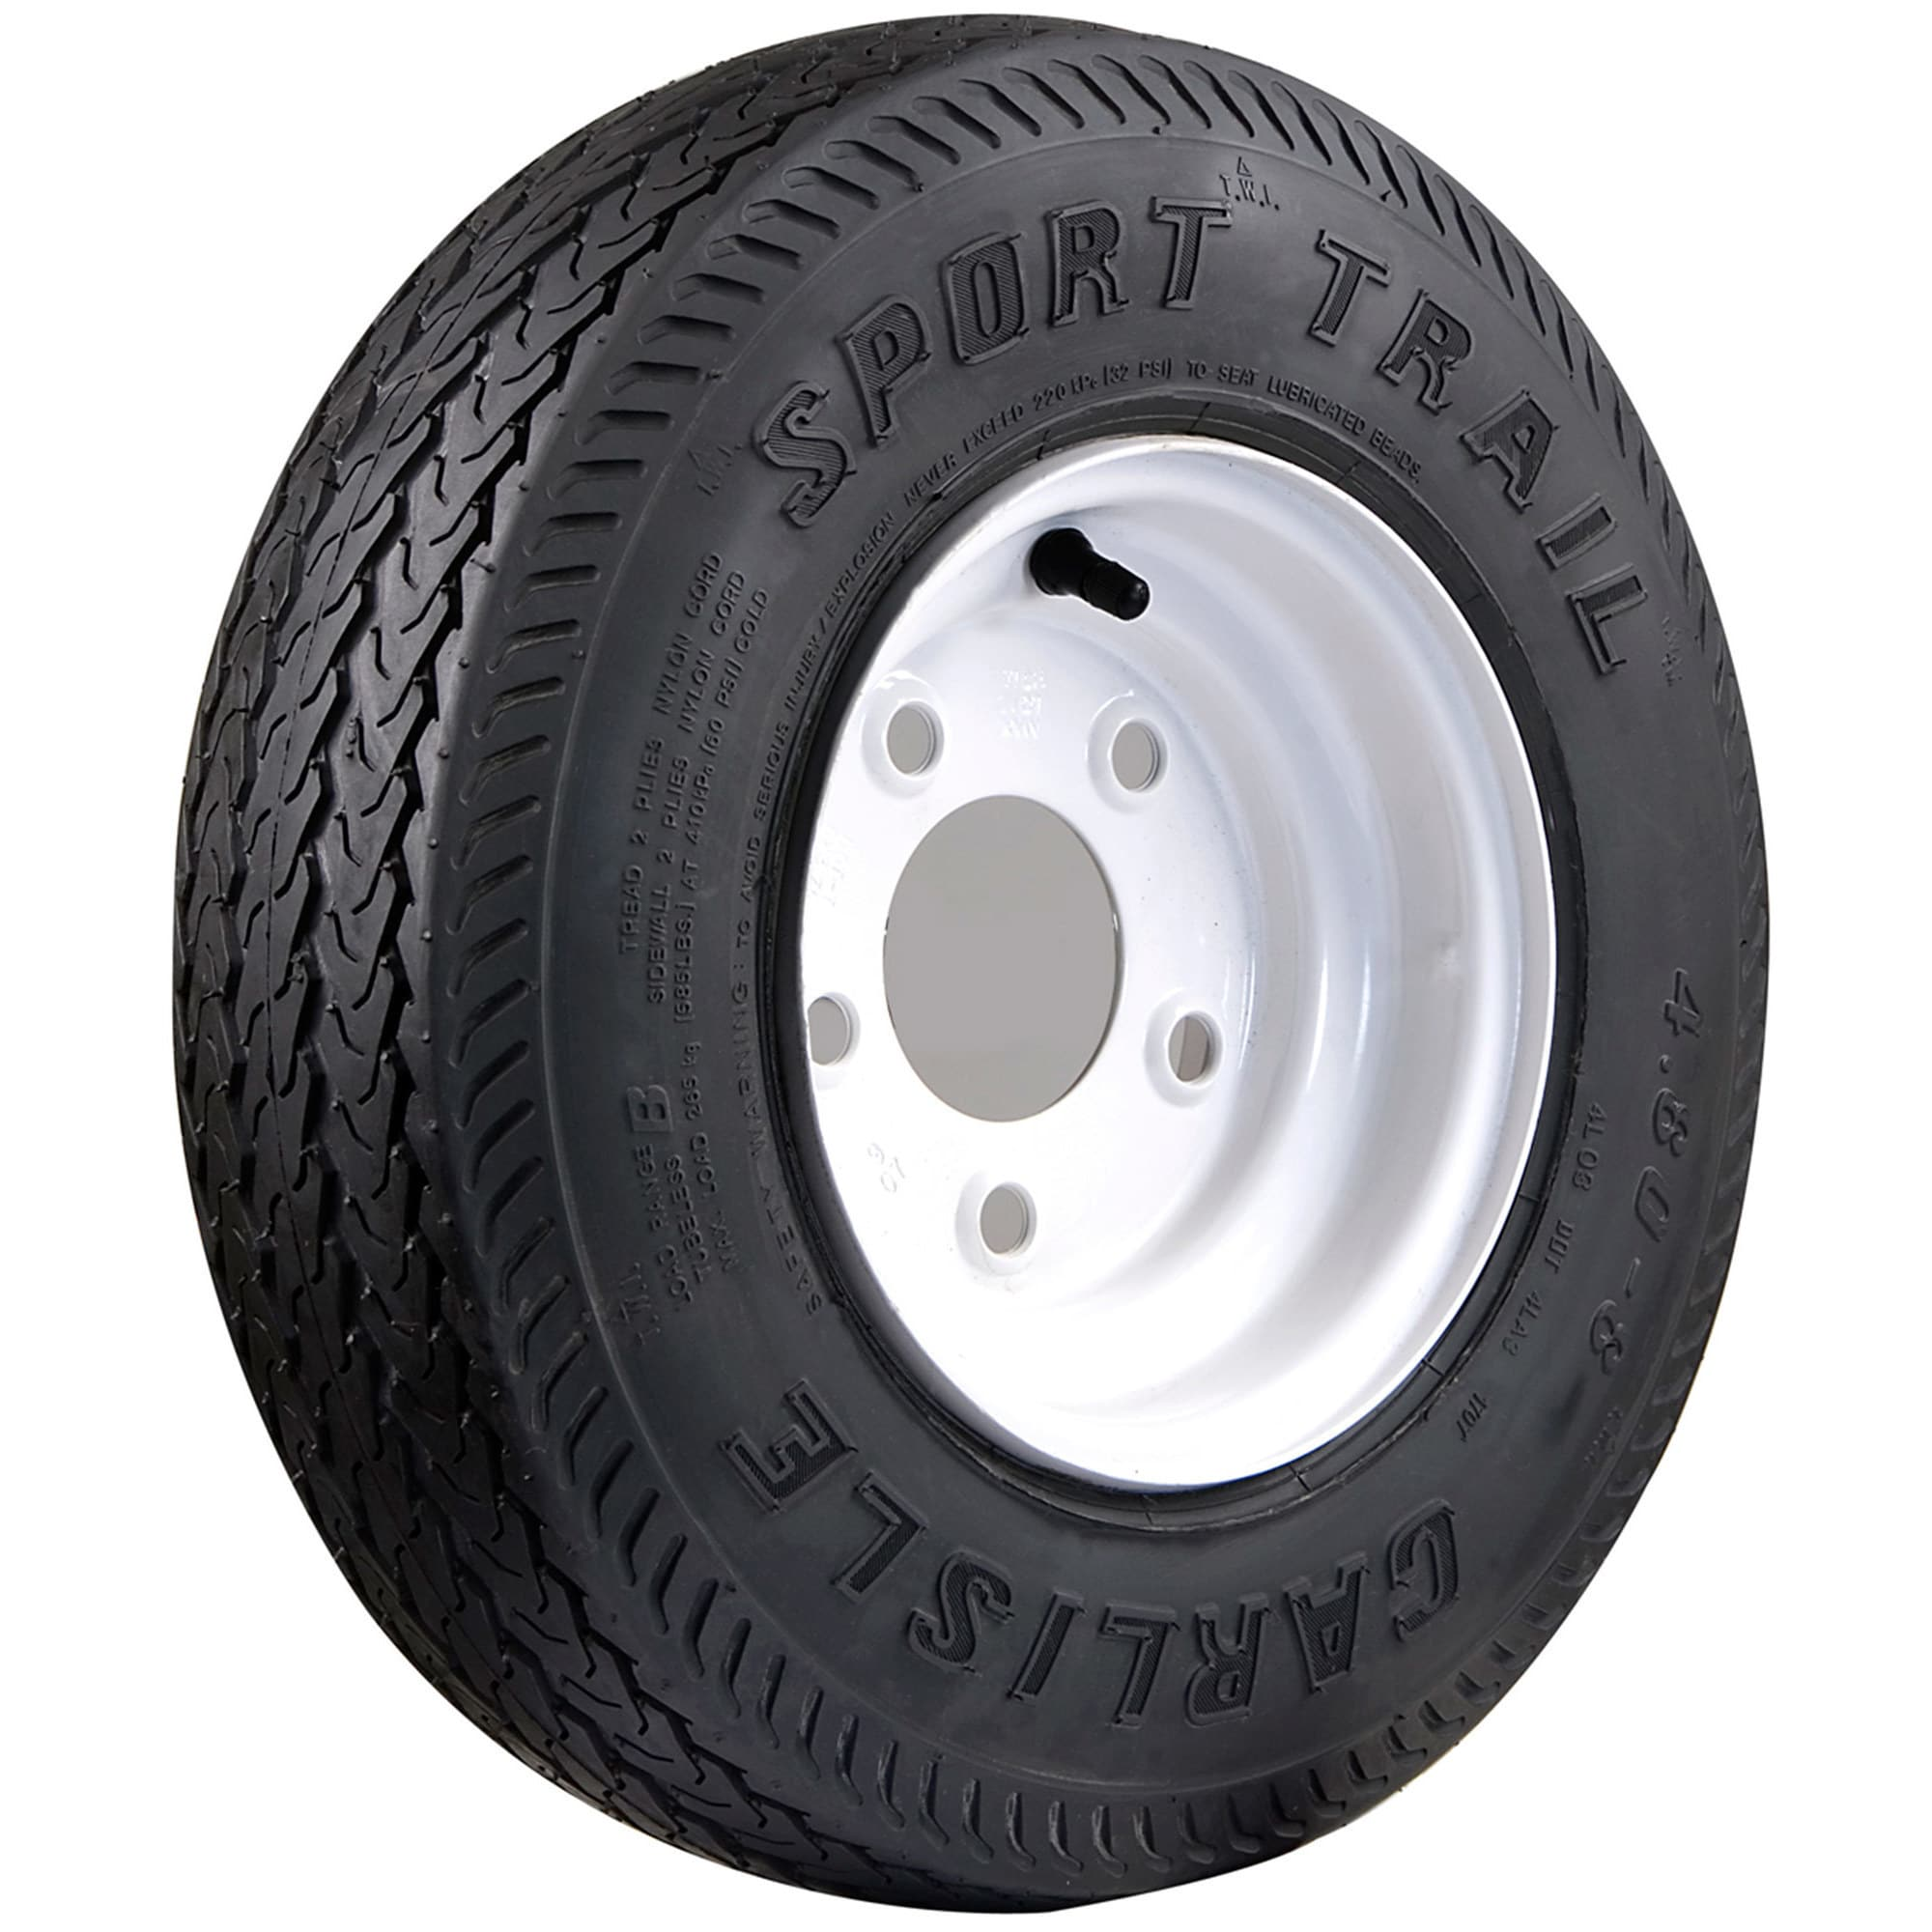 Carlisle Sport Trail Bias Trailer Tire - 20.5/8.0-10 LRE/...